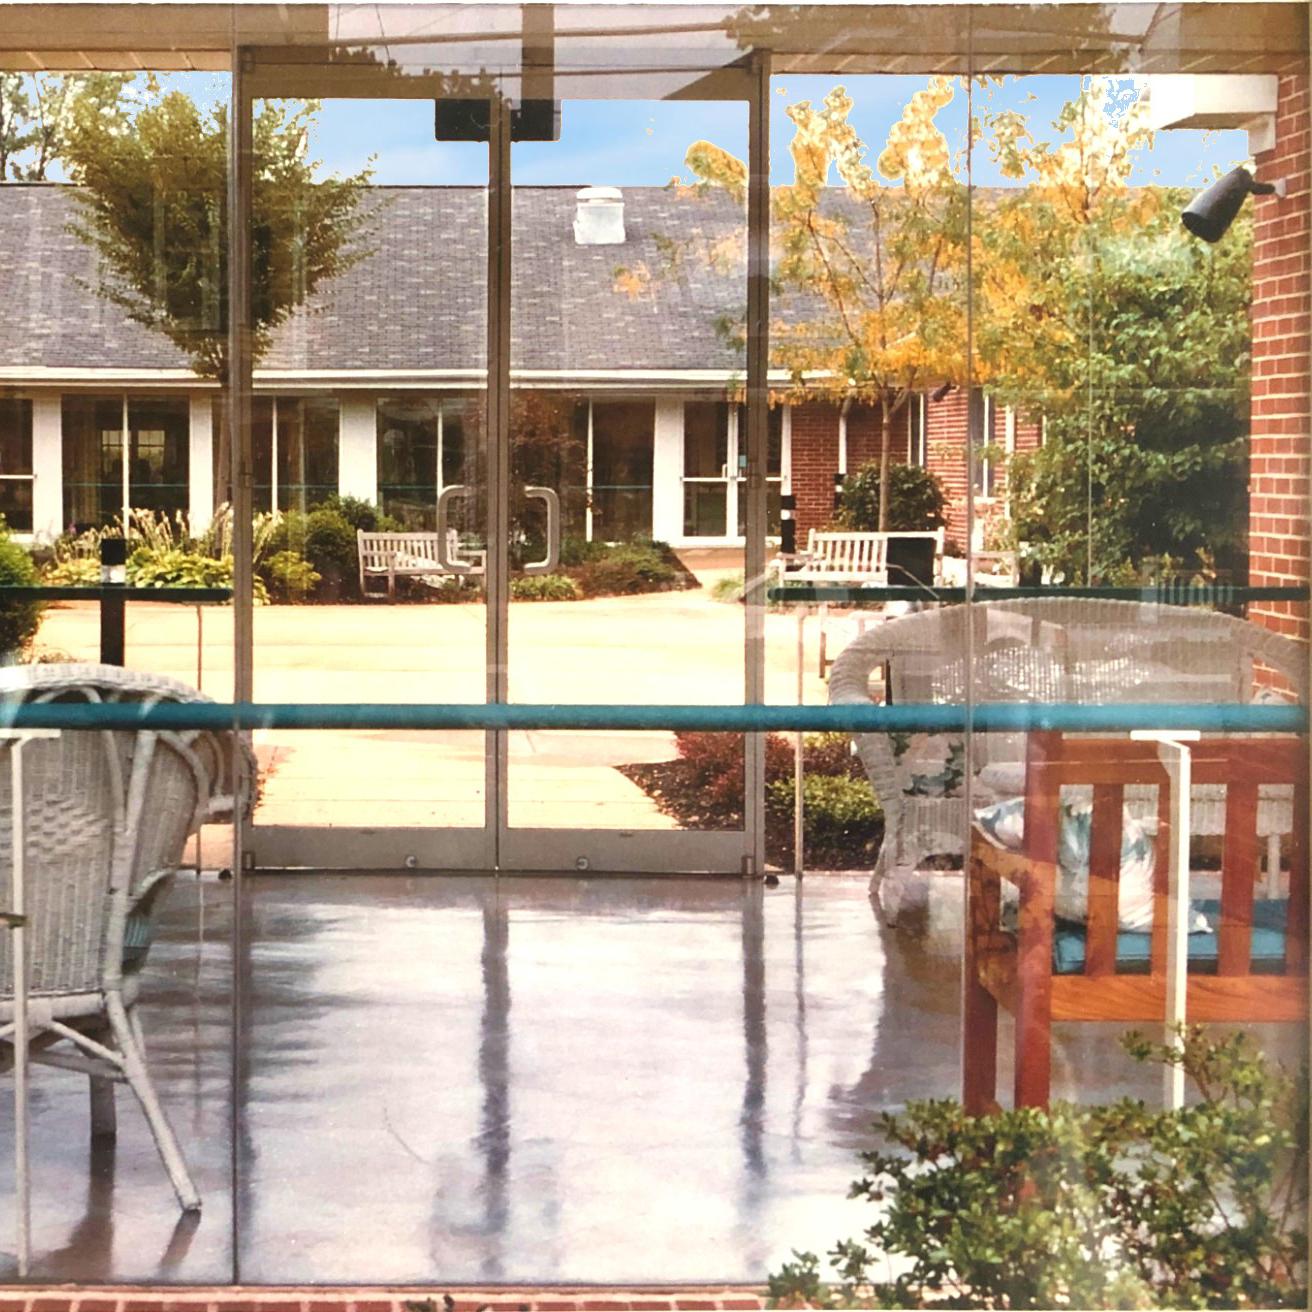 Image of courtyard at Kadima at Campbelltown Healthcare Group Nursing and Rehabilitation Facility